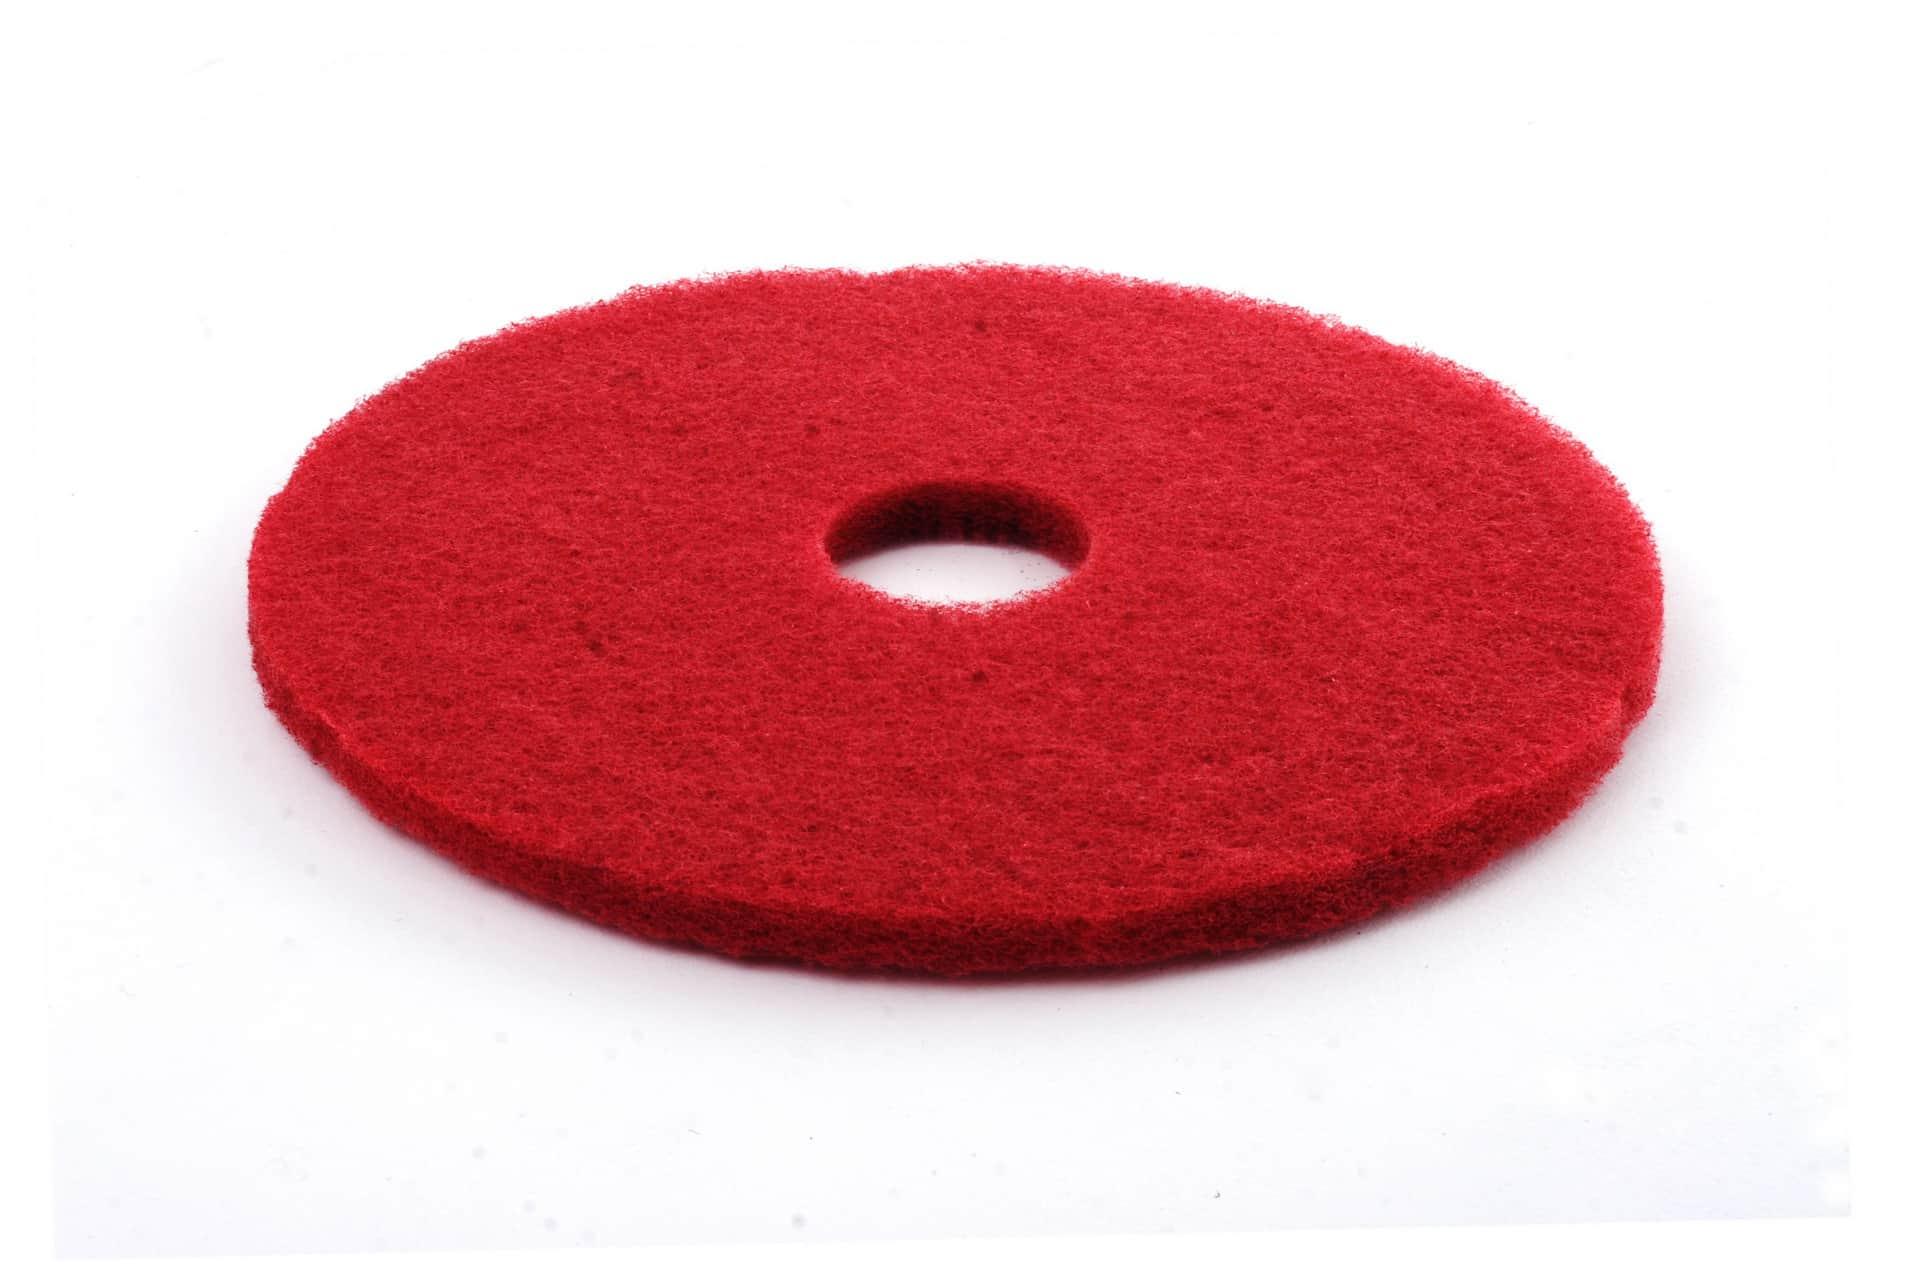 3M_red_buffer_pad_5100_แผ่นขัดเงาพื้นสีแดง_01